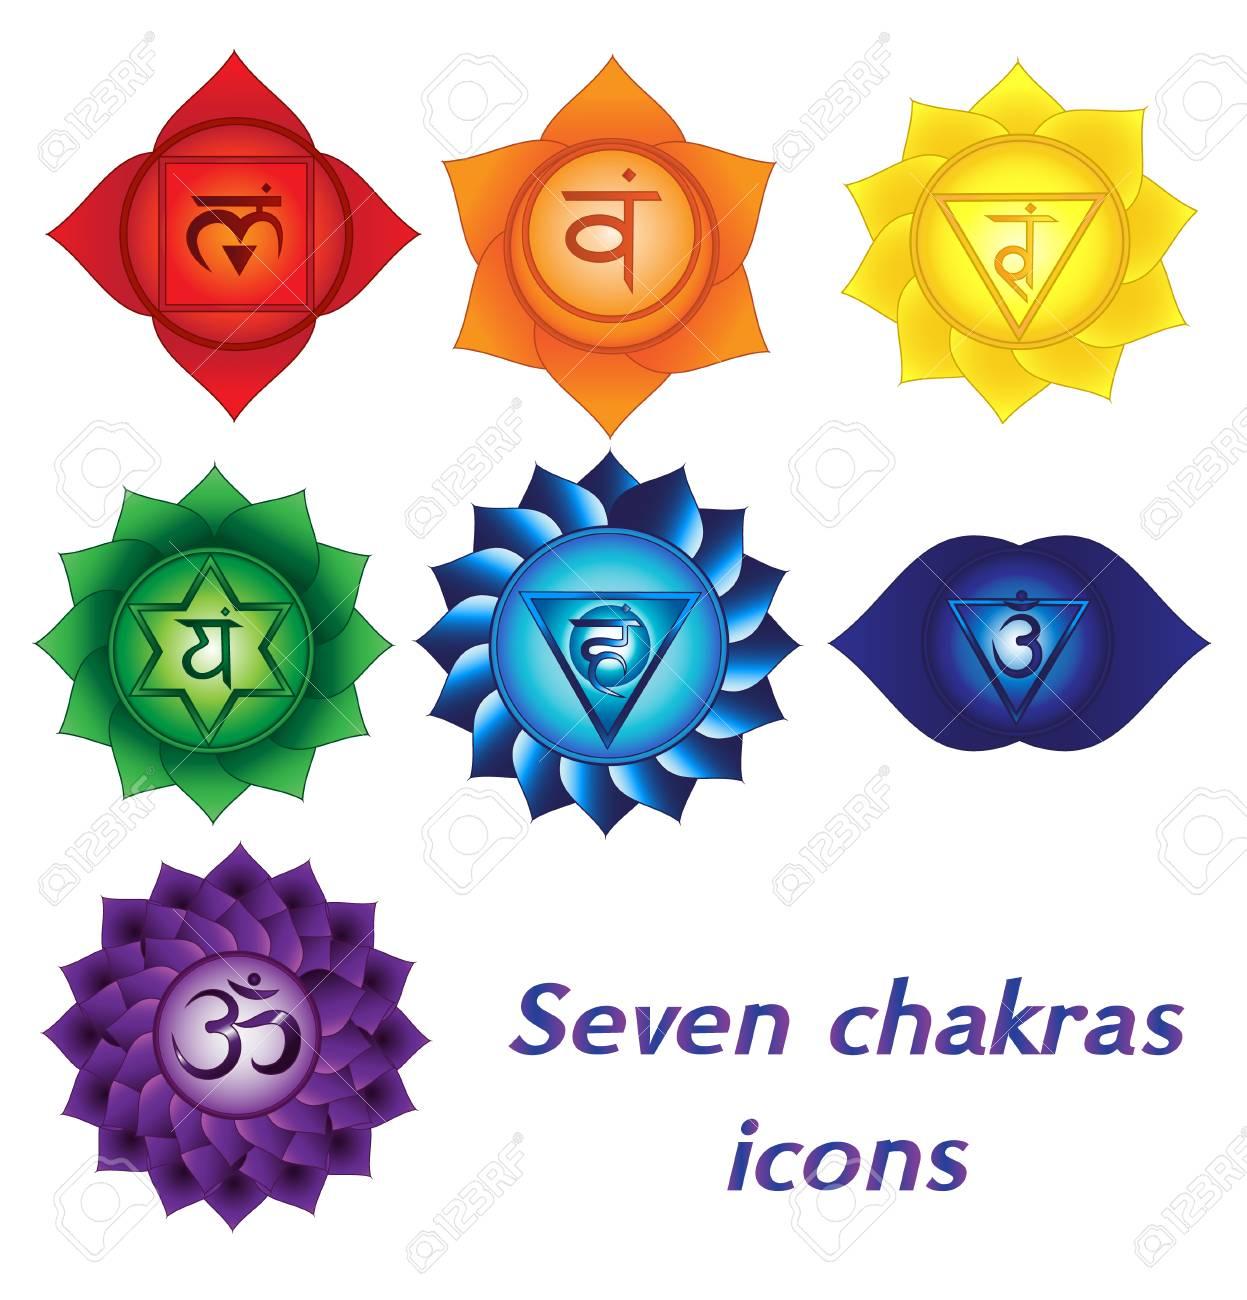 Seven chakras icons. Colorful spiritual tattoos kundalini yoga symbols. - 93889226